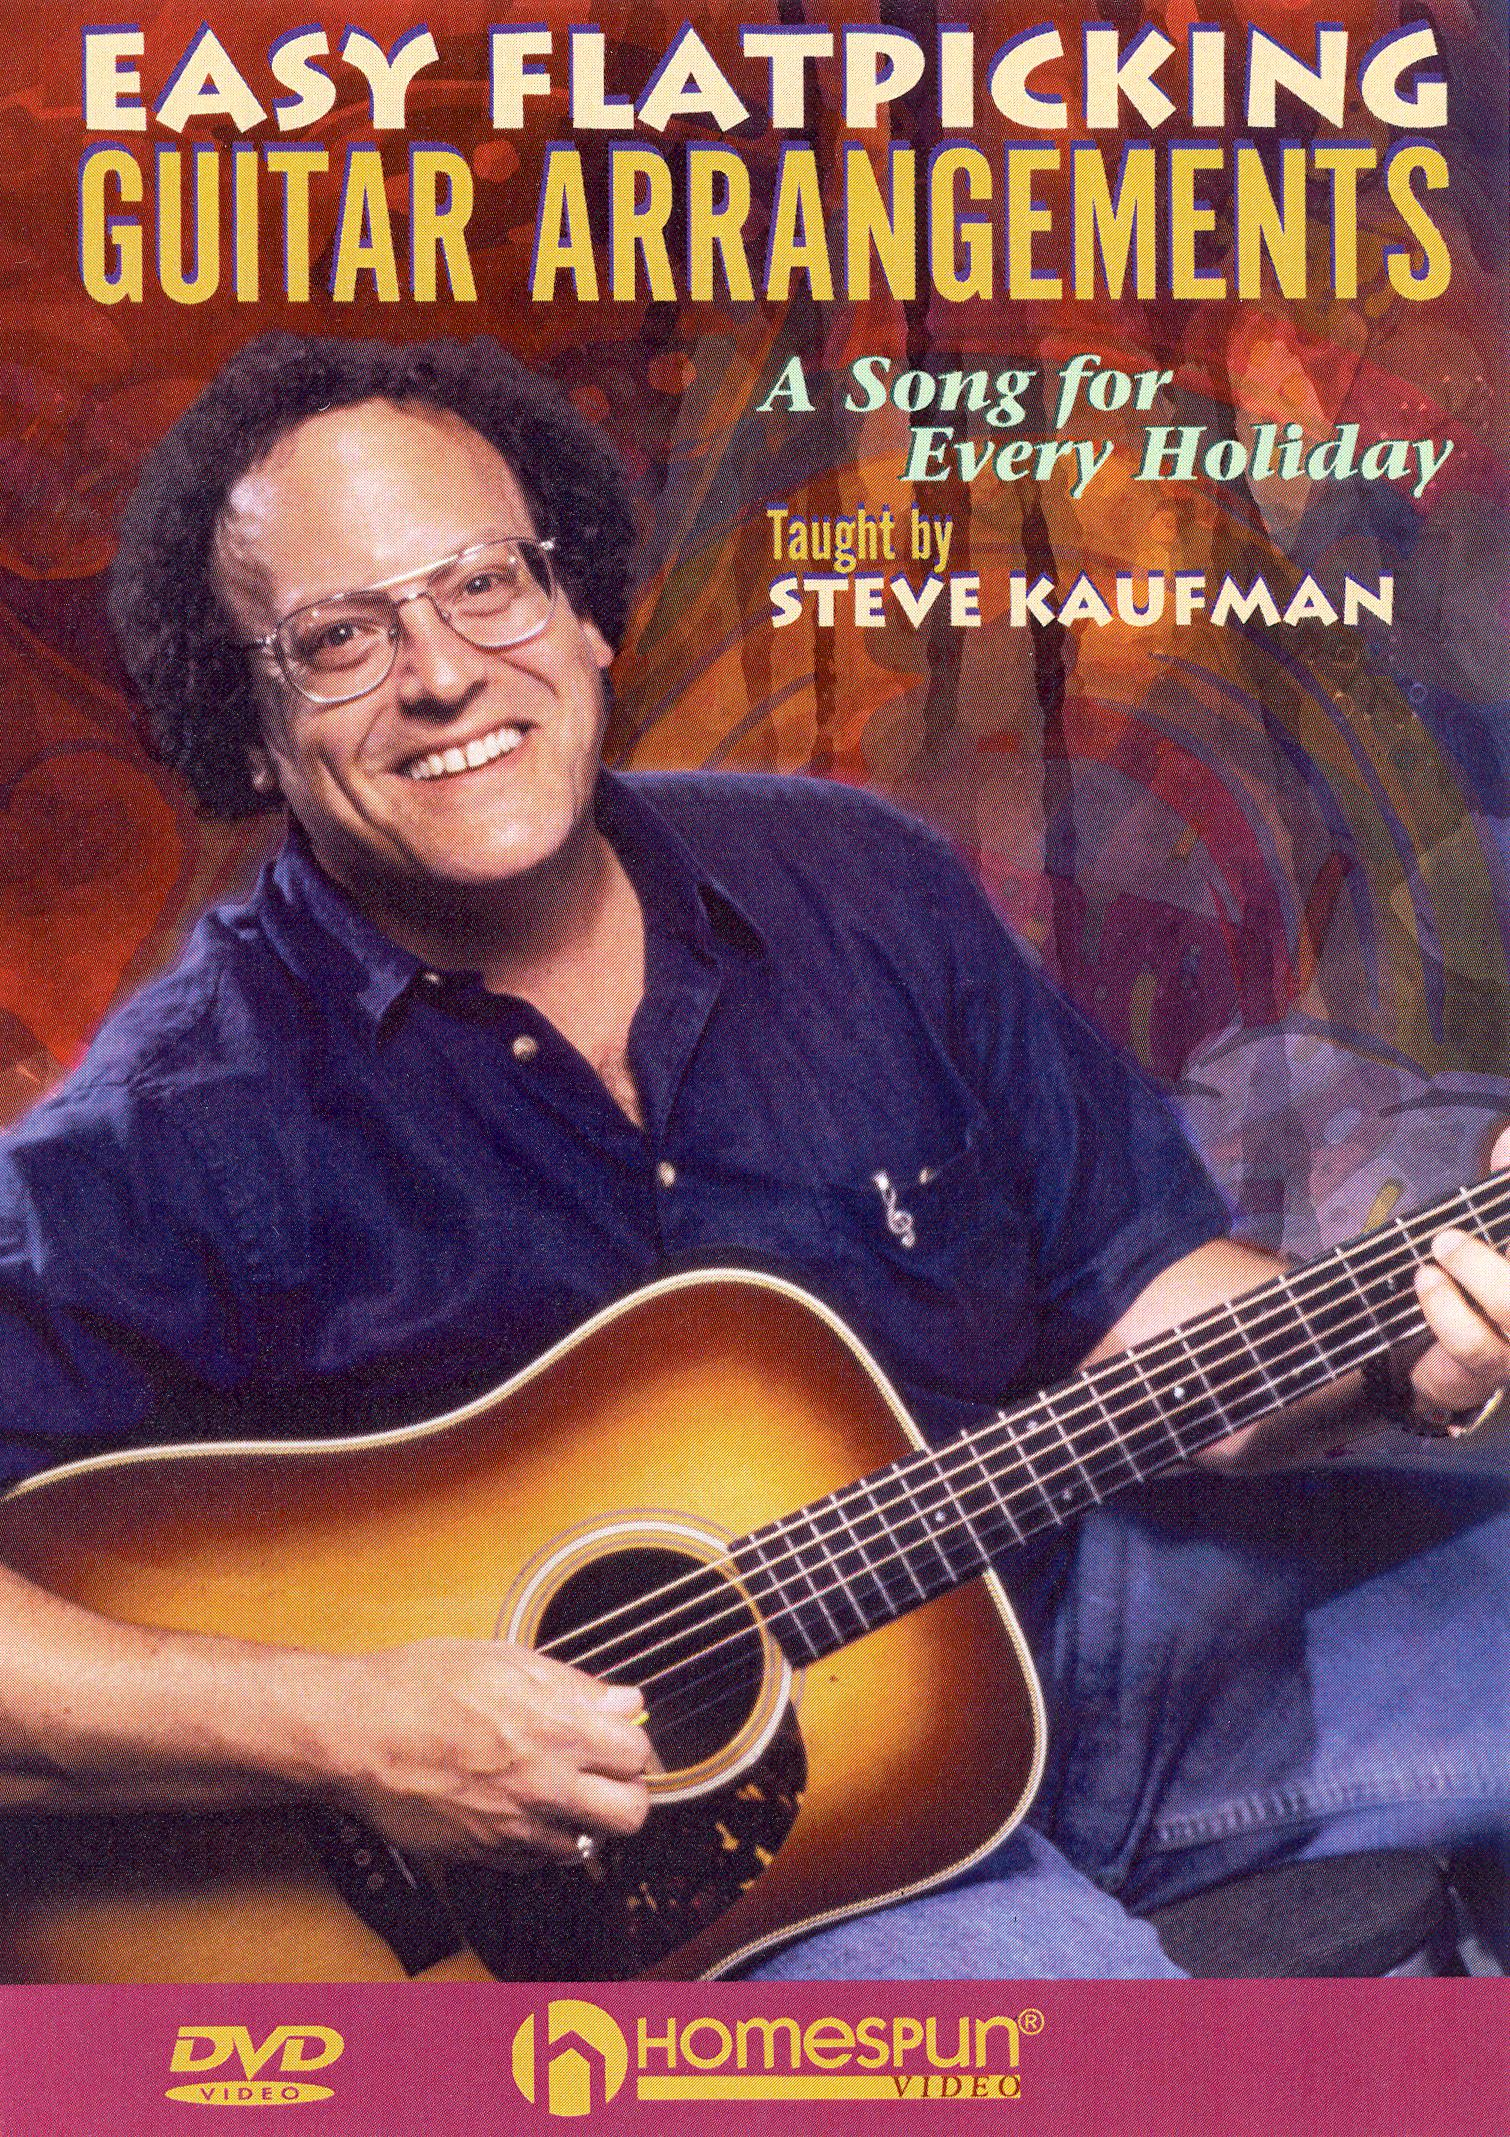 Steve Kaufman: Easy Flatpicking Guitar Arrangements